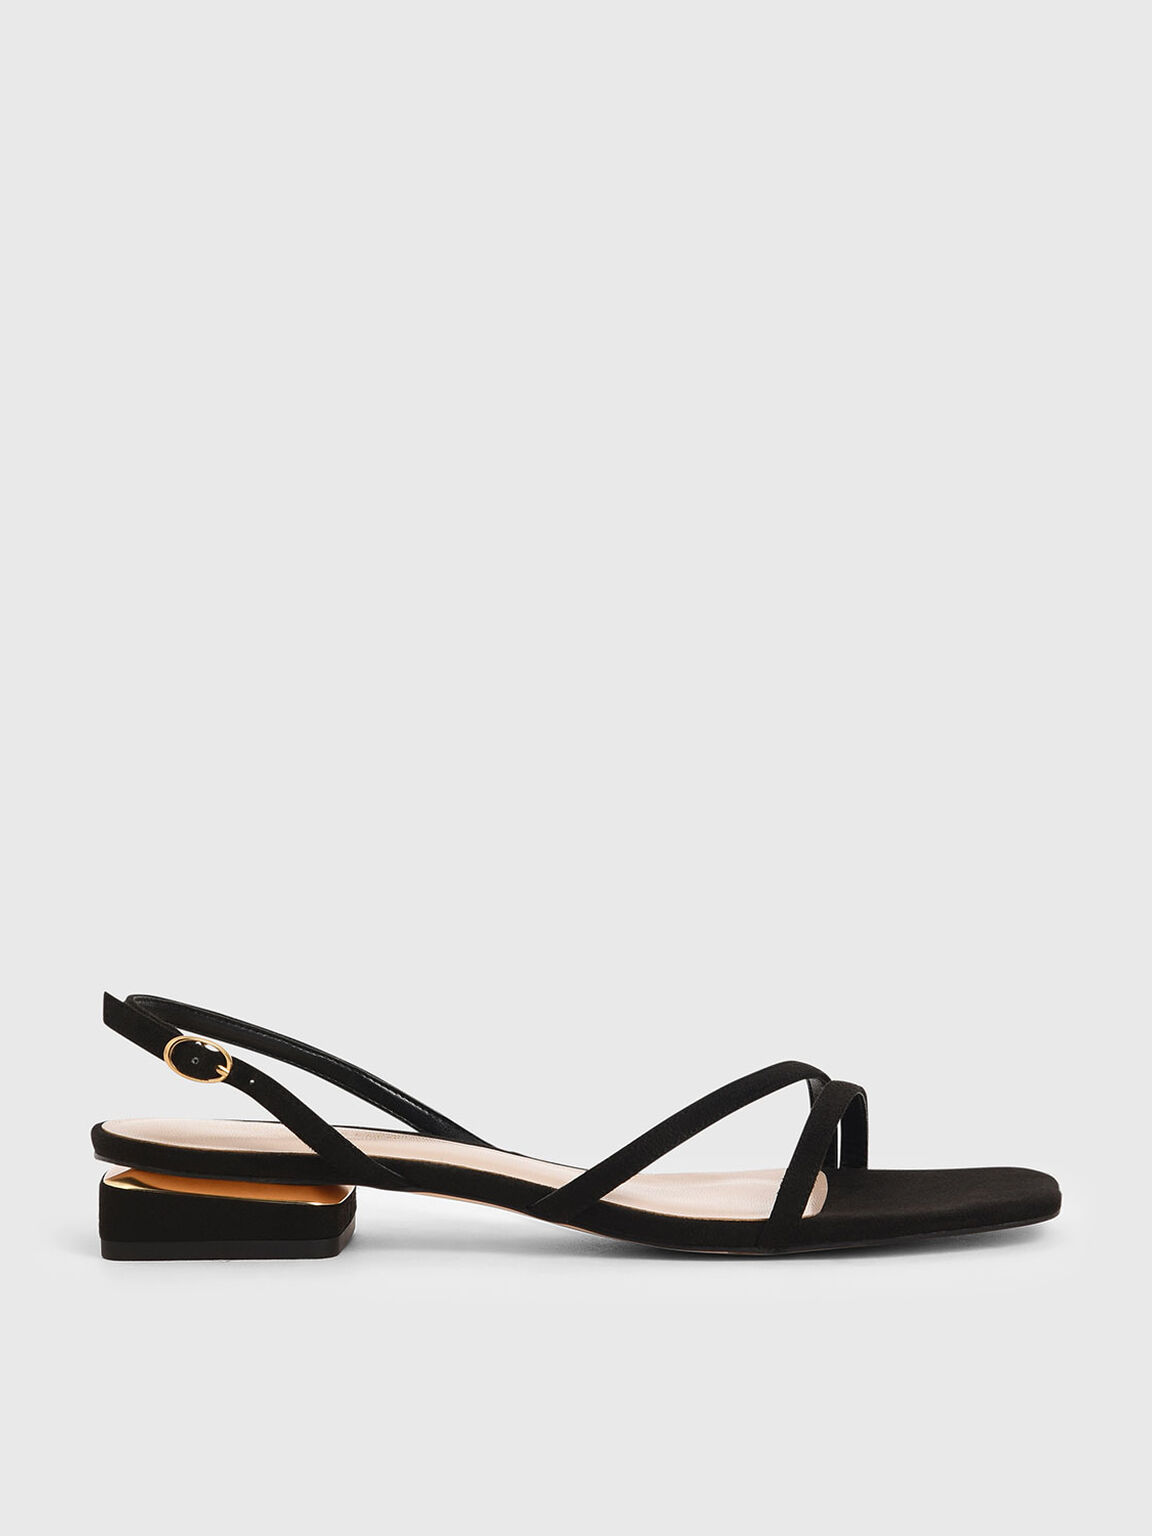 Textured Strappy Slingback Heels, Black, hi-res